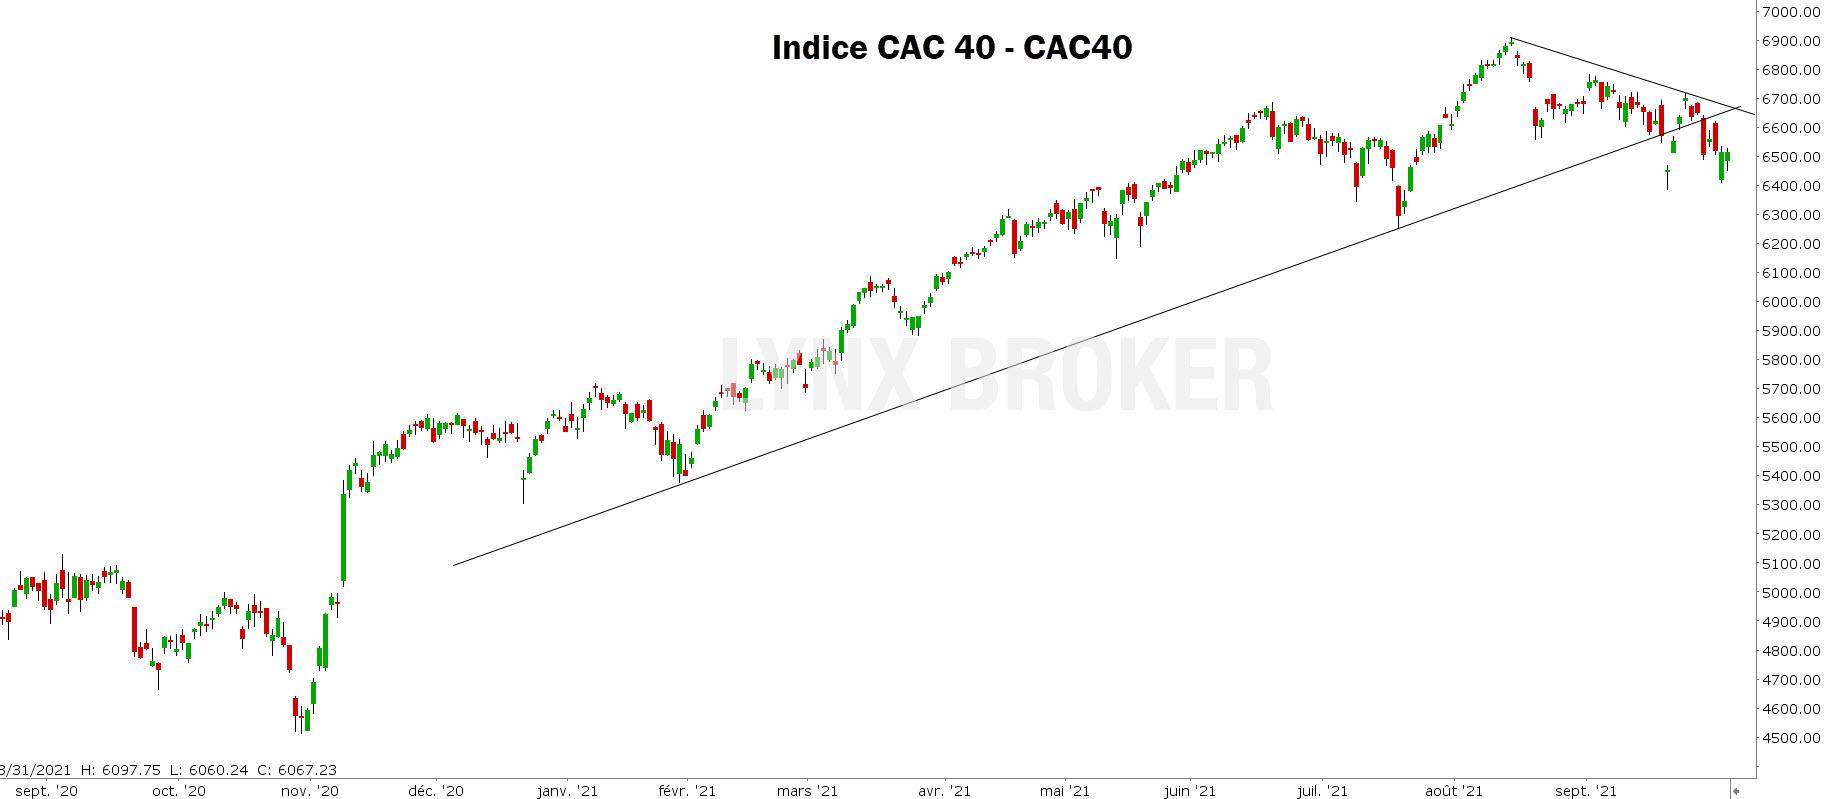 analyse technique CAC 40 - indice CAC 40 - 04102021